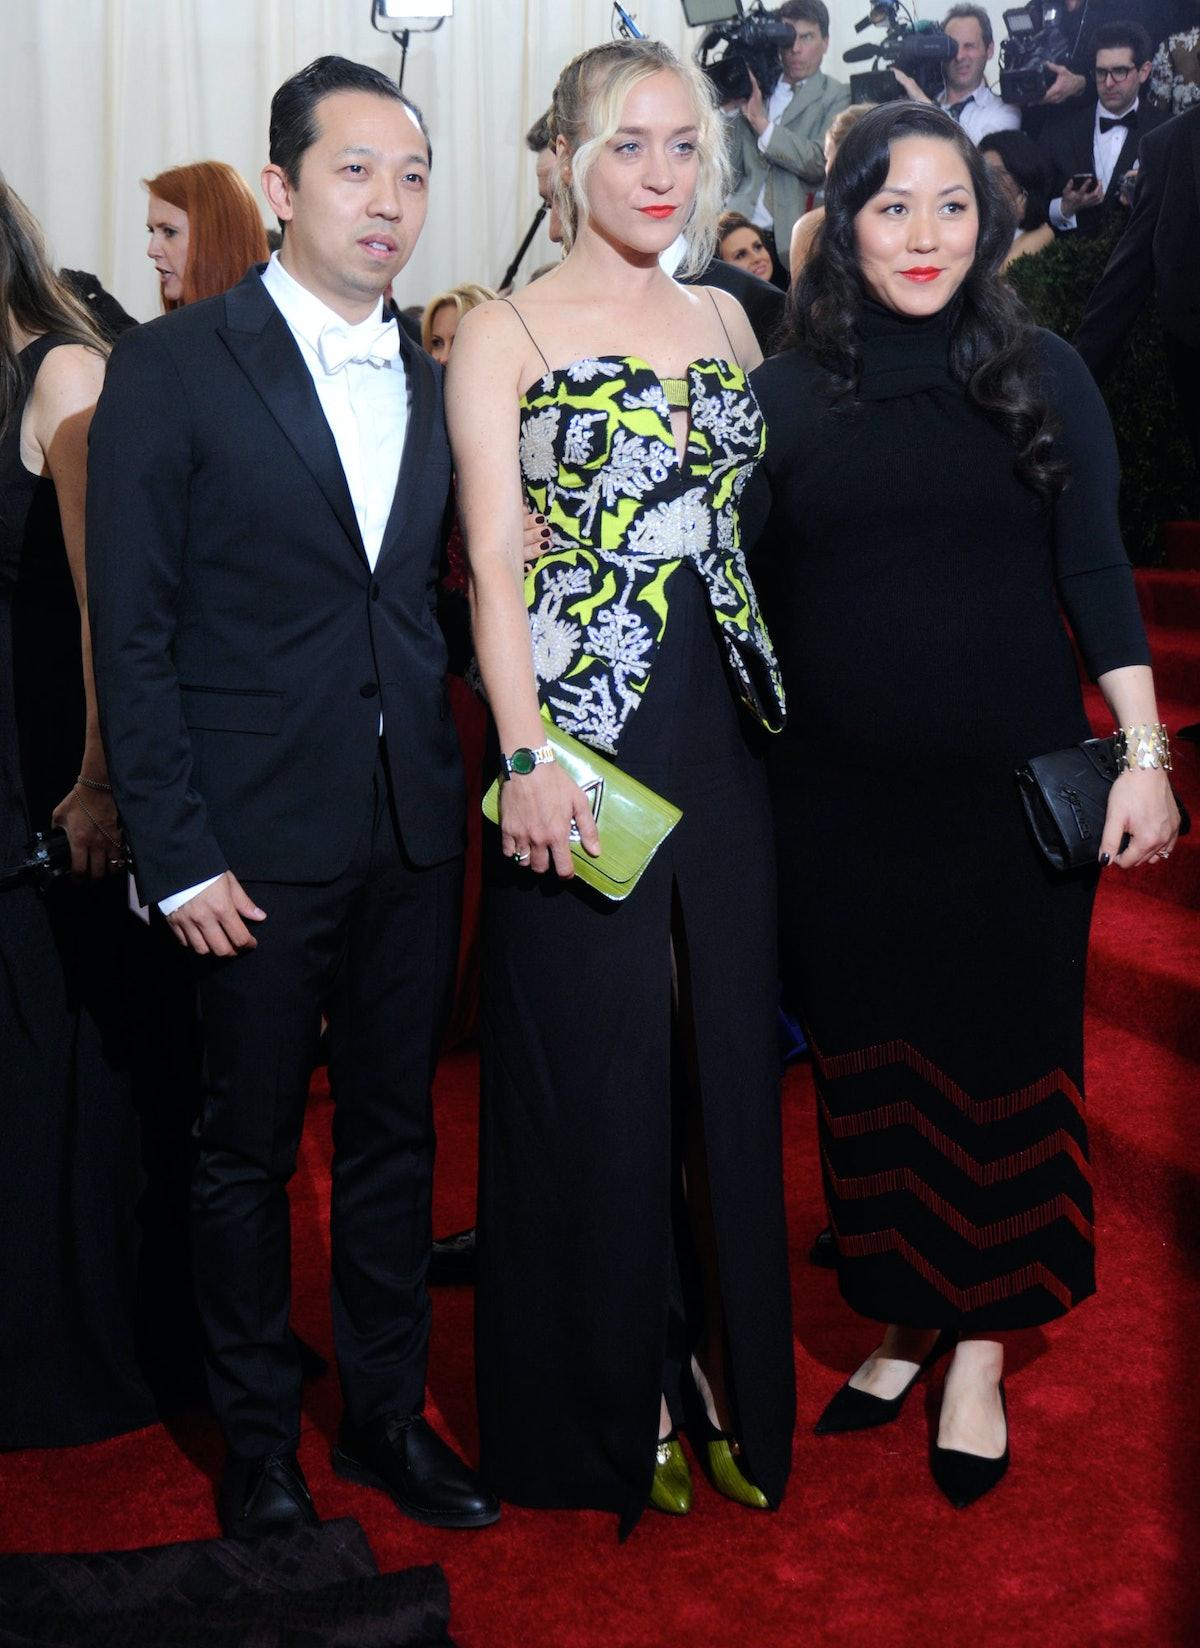 Humberto Leon, Chloe Sevigny, and Carol Lim